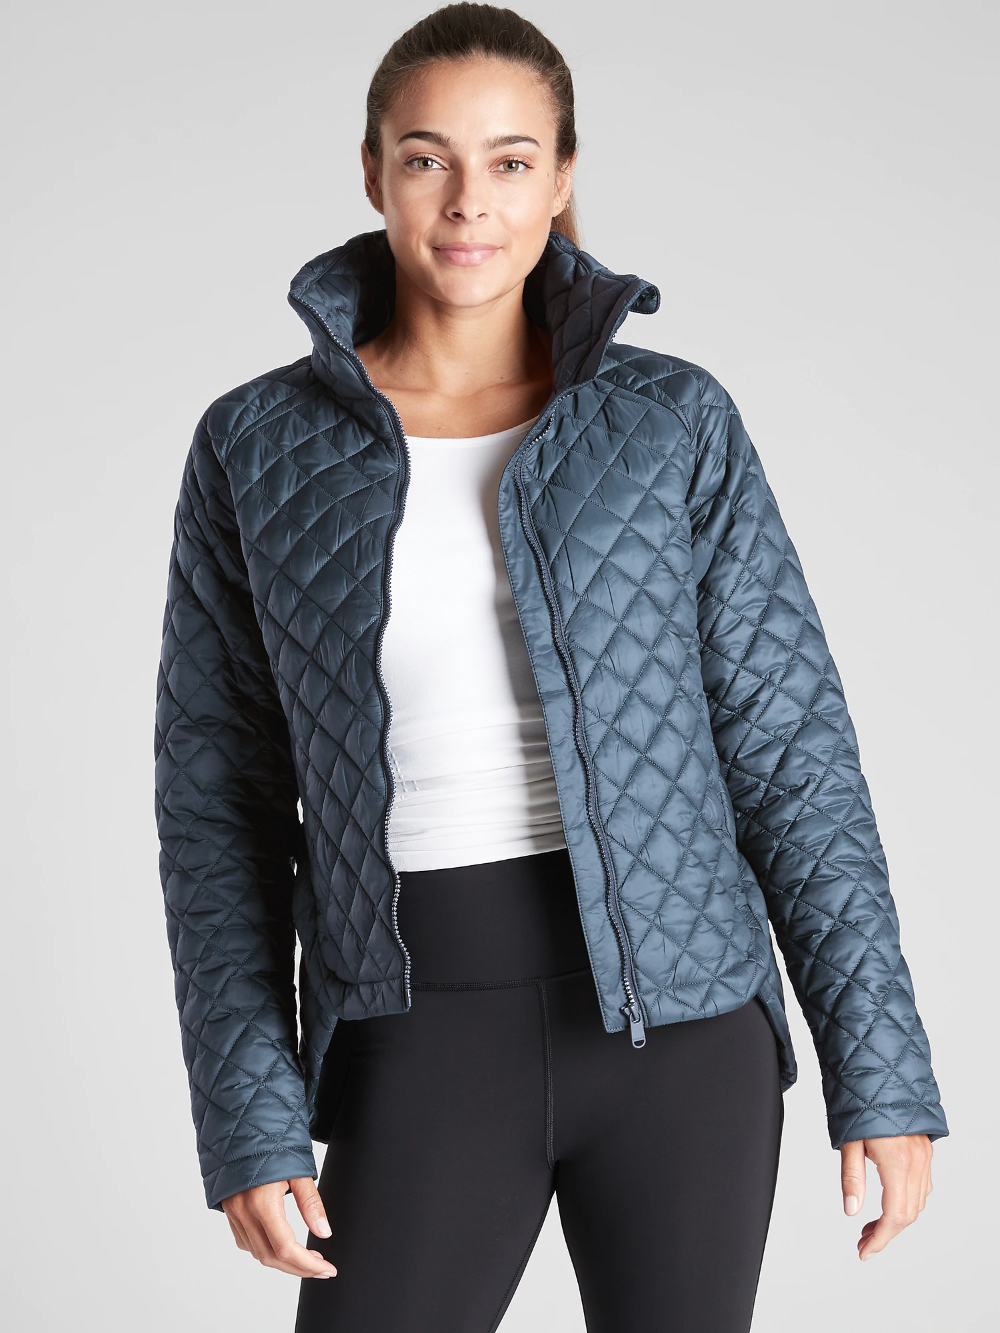 Whisper Featherless Jacket Athleta Jackets Jackets For Women Athleta [ 1333 x 1000 Pixel ]